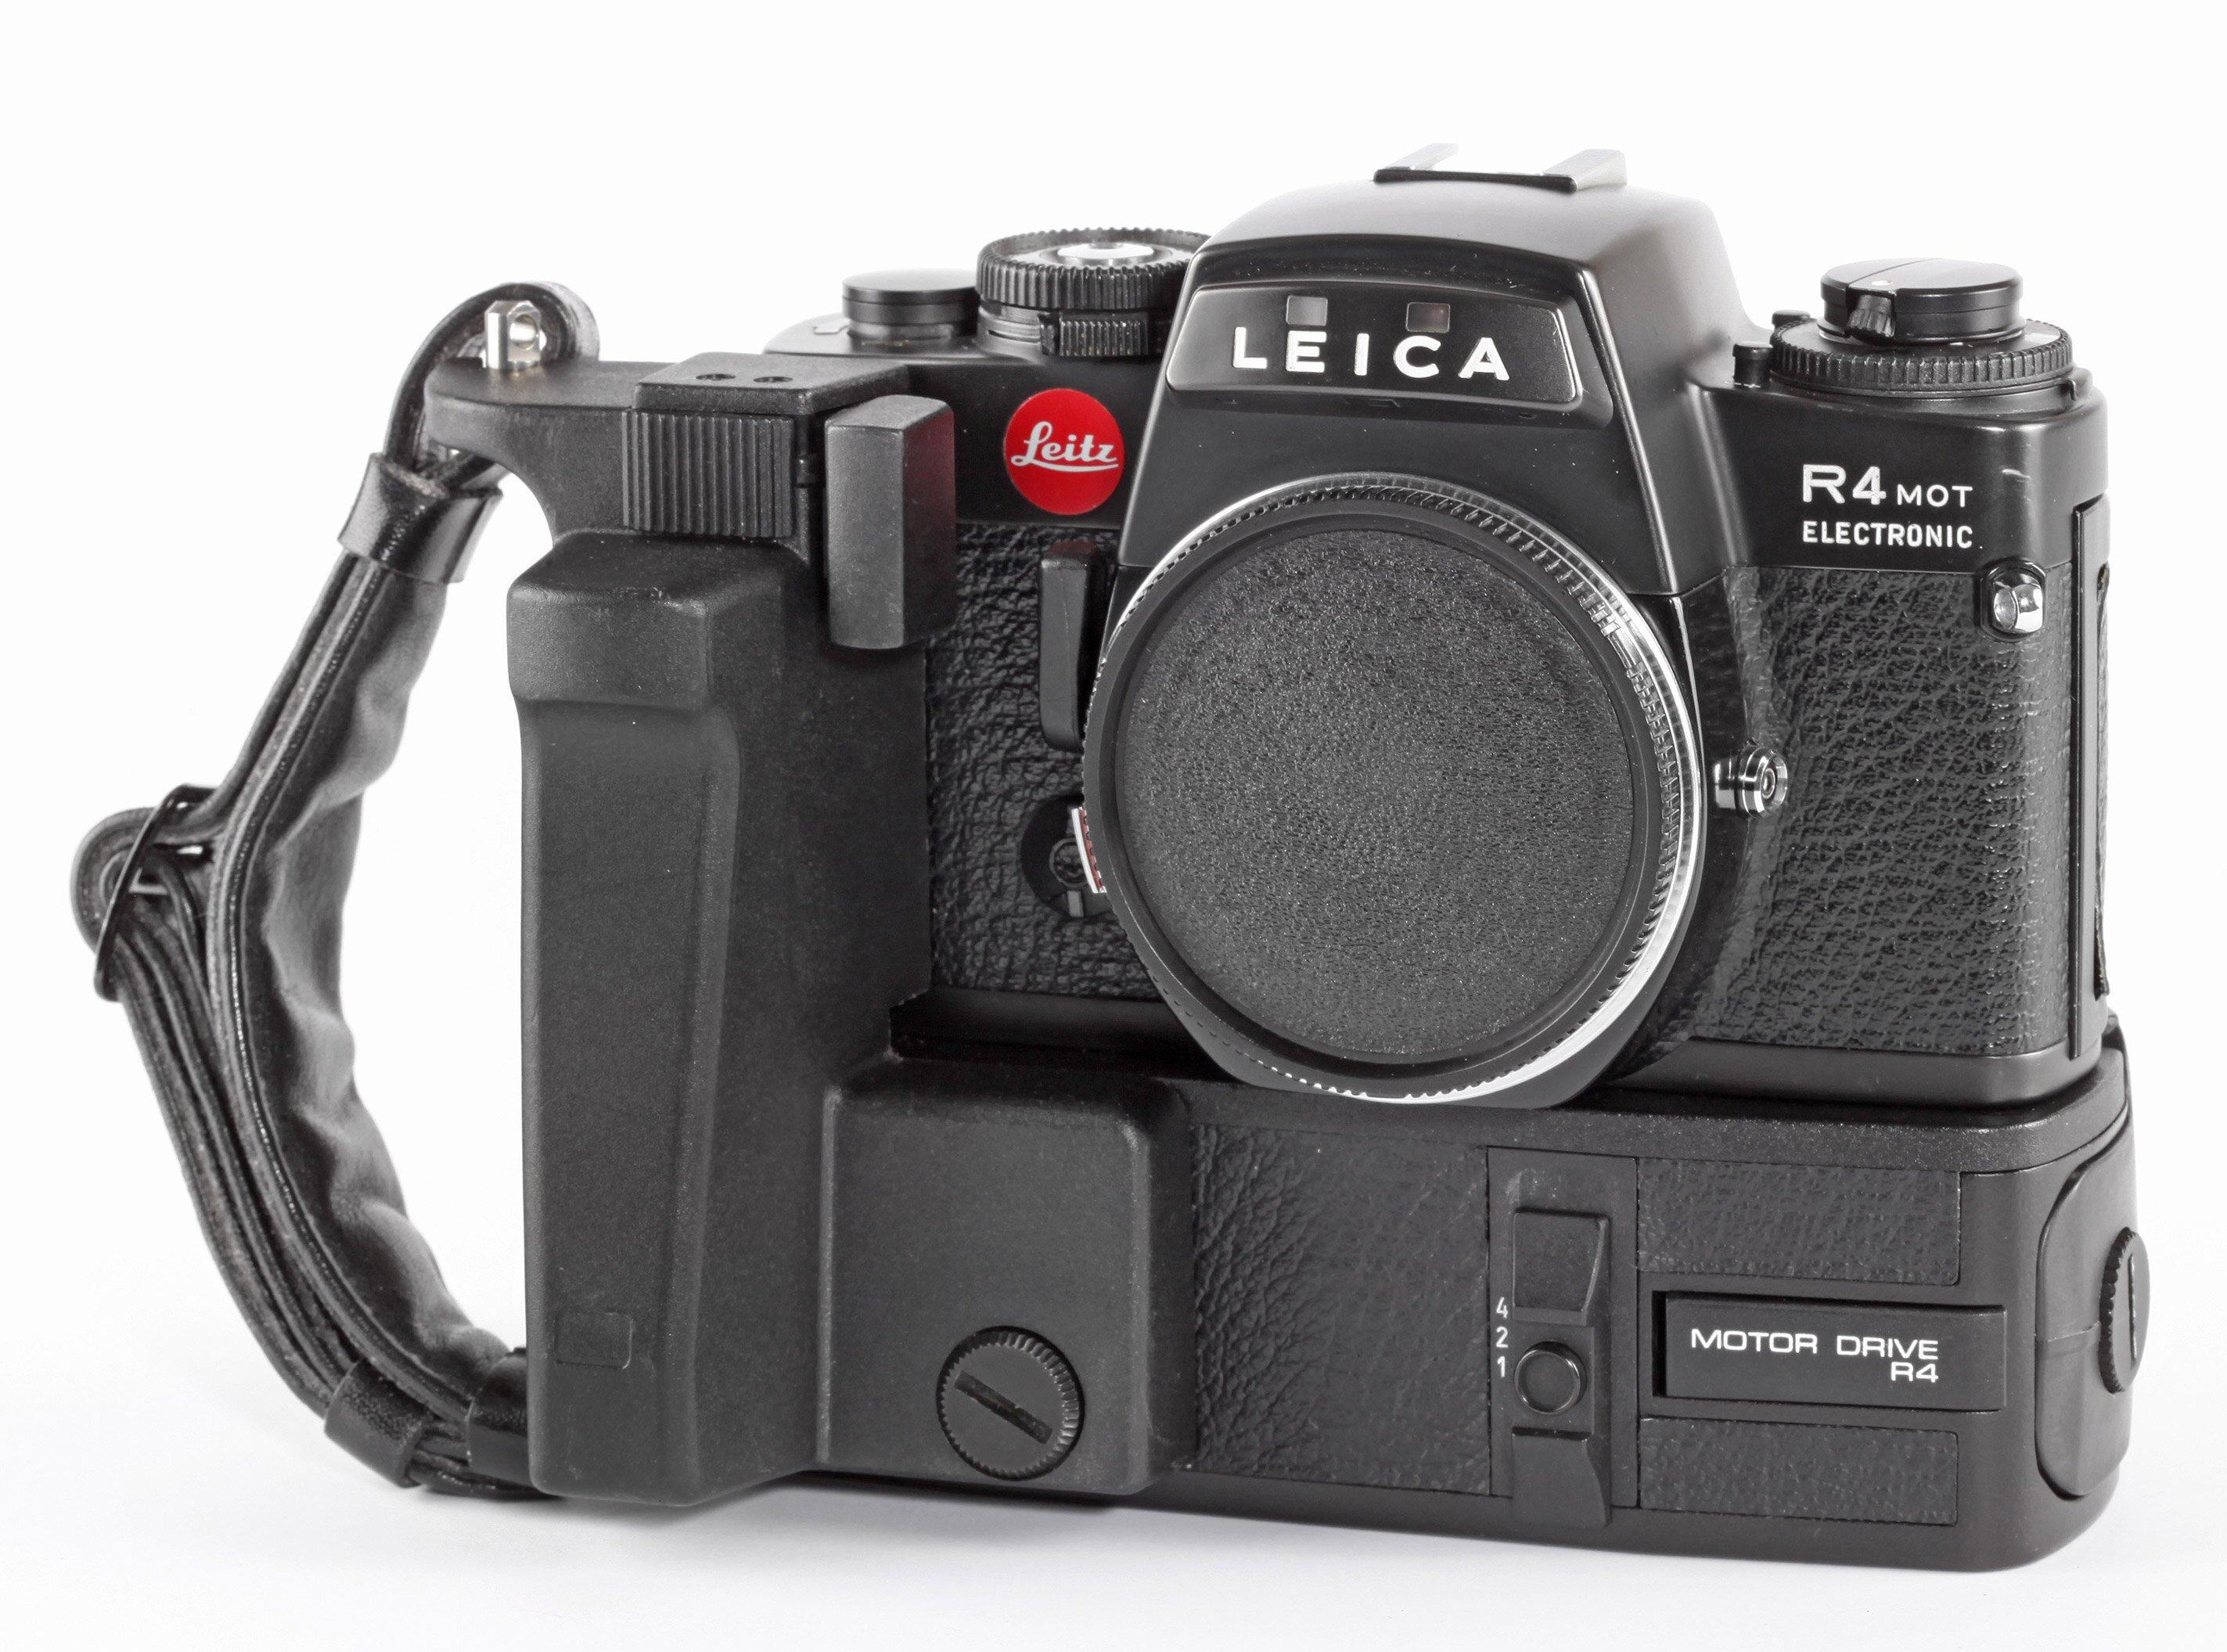 Leica R4 Mot Electronic Motor Drive R4